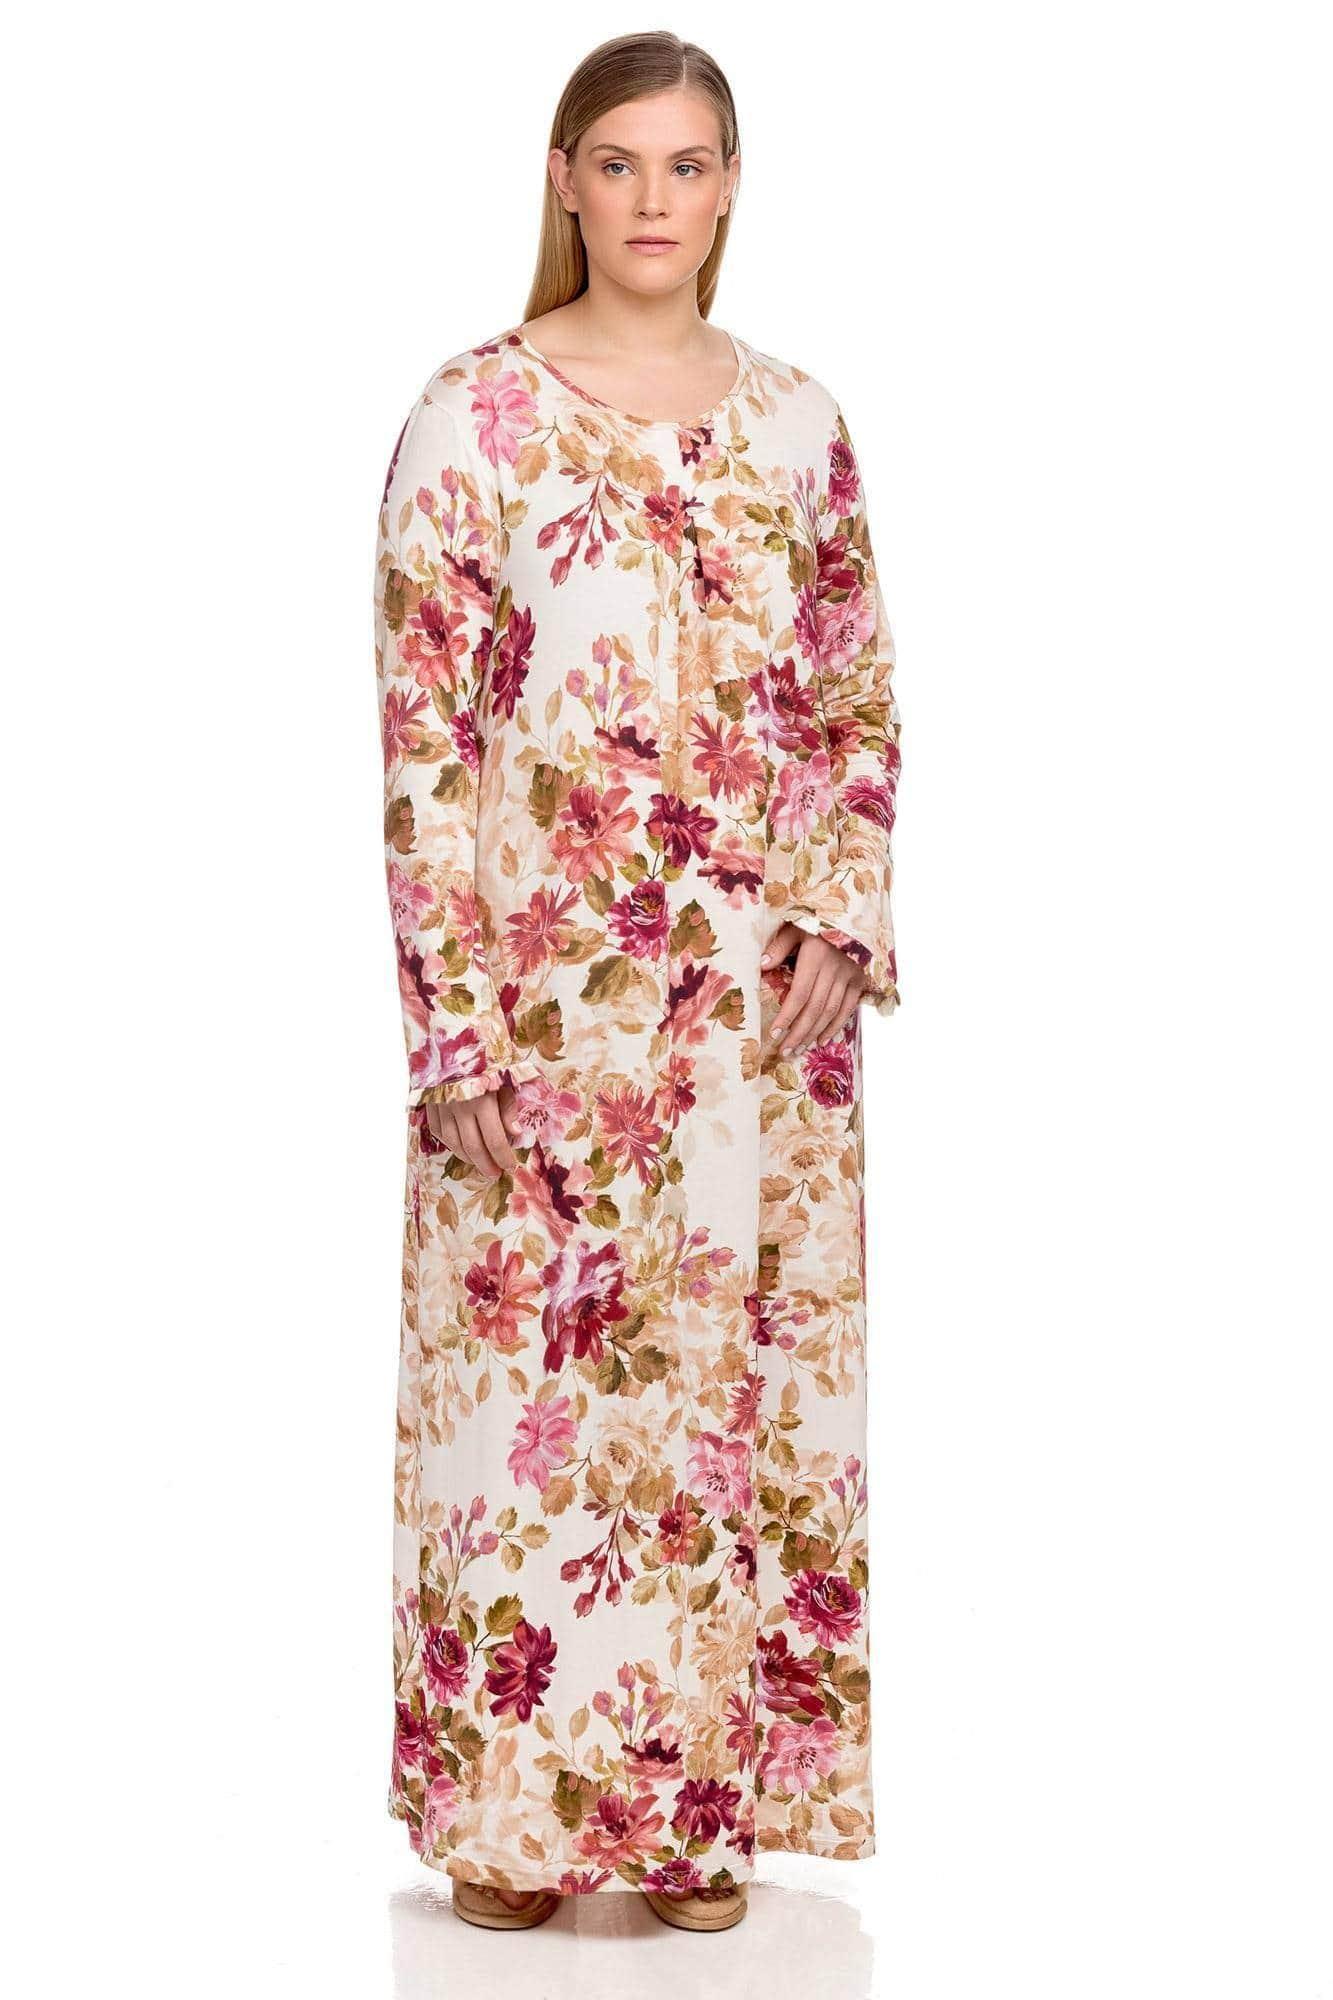 Women's long fit nightgown